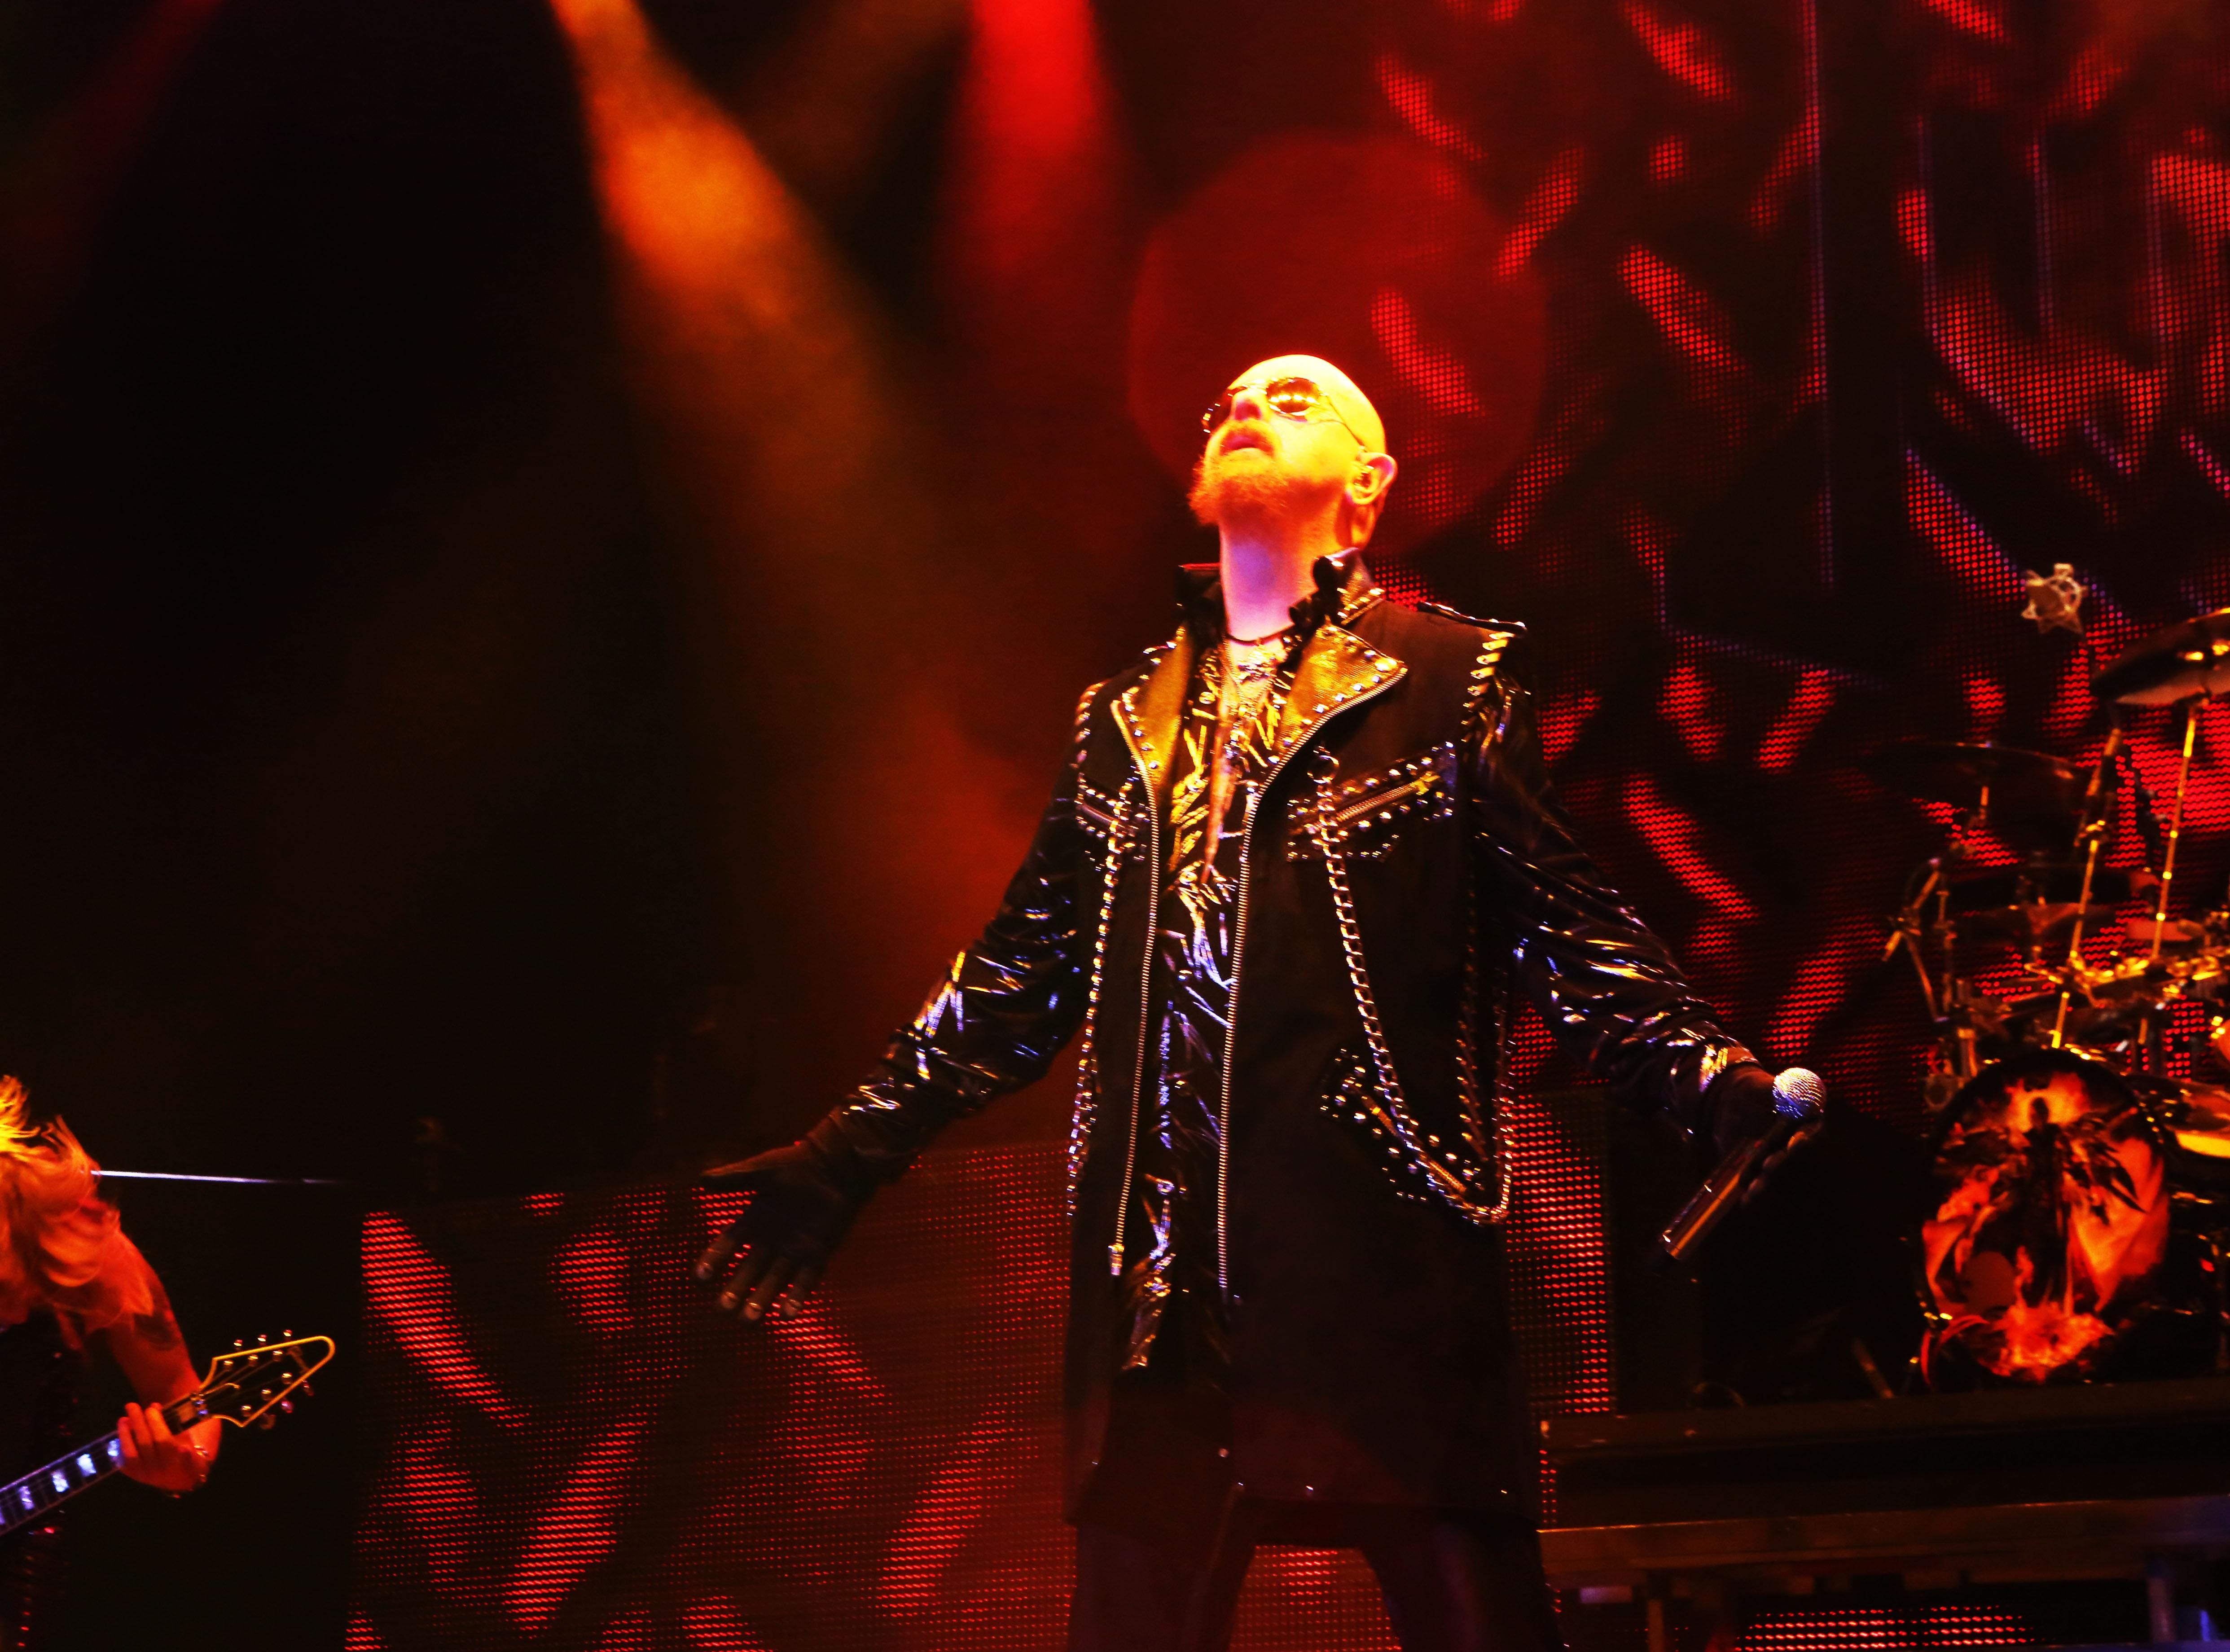 Judas Priest Background